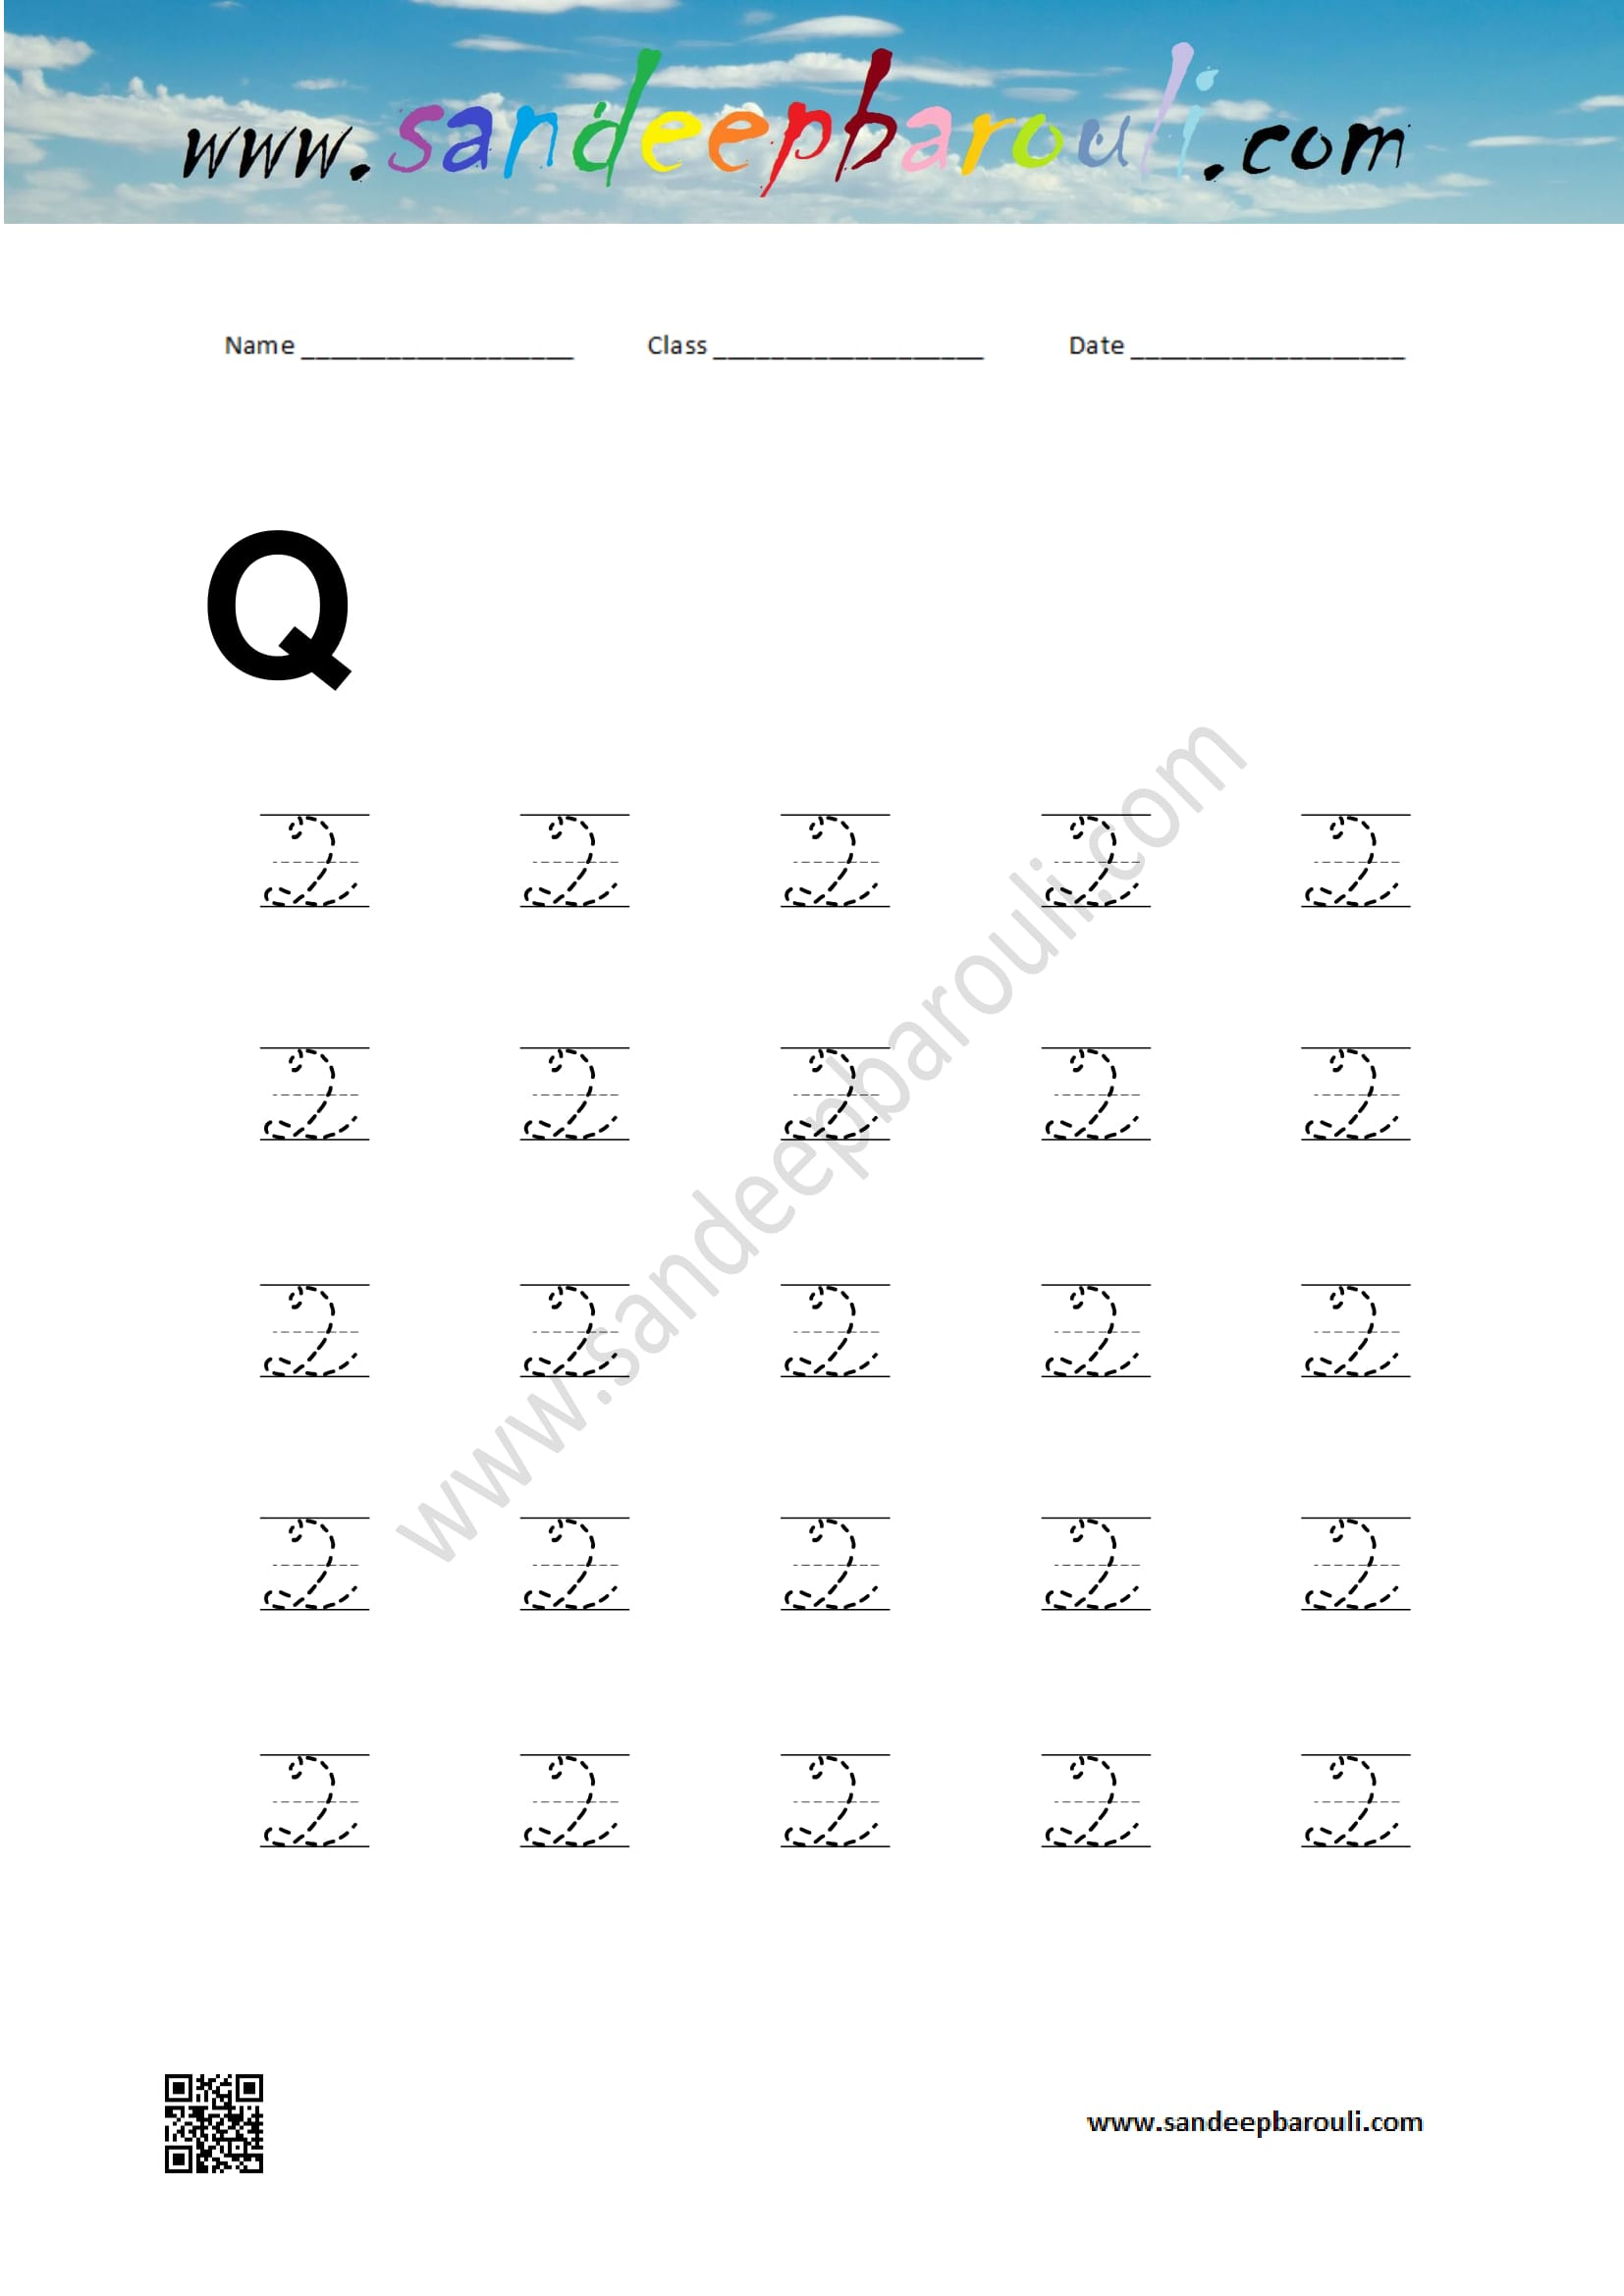 Cursive Writing Worksheet For Q Sandeepbarouli